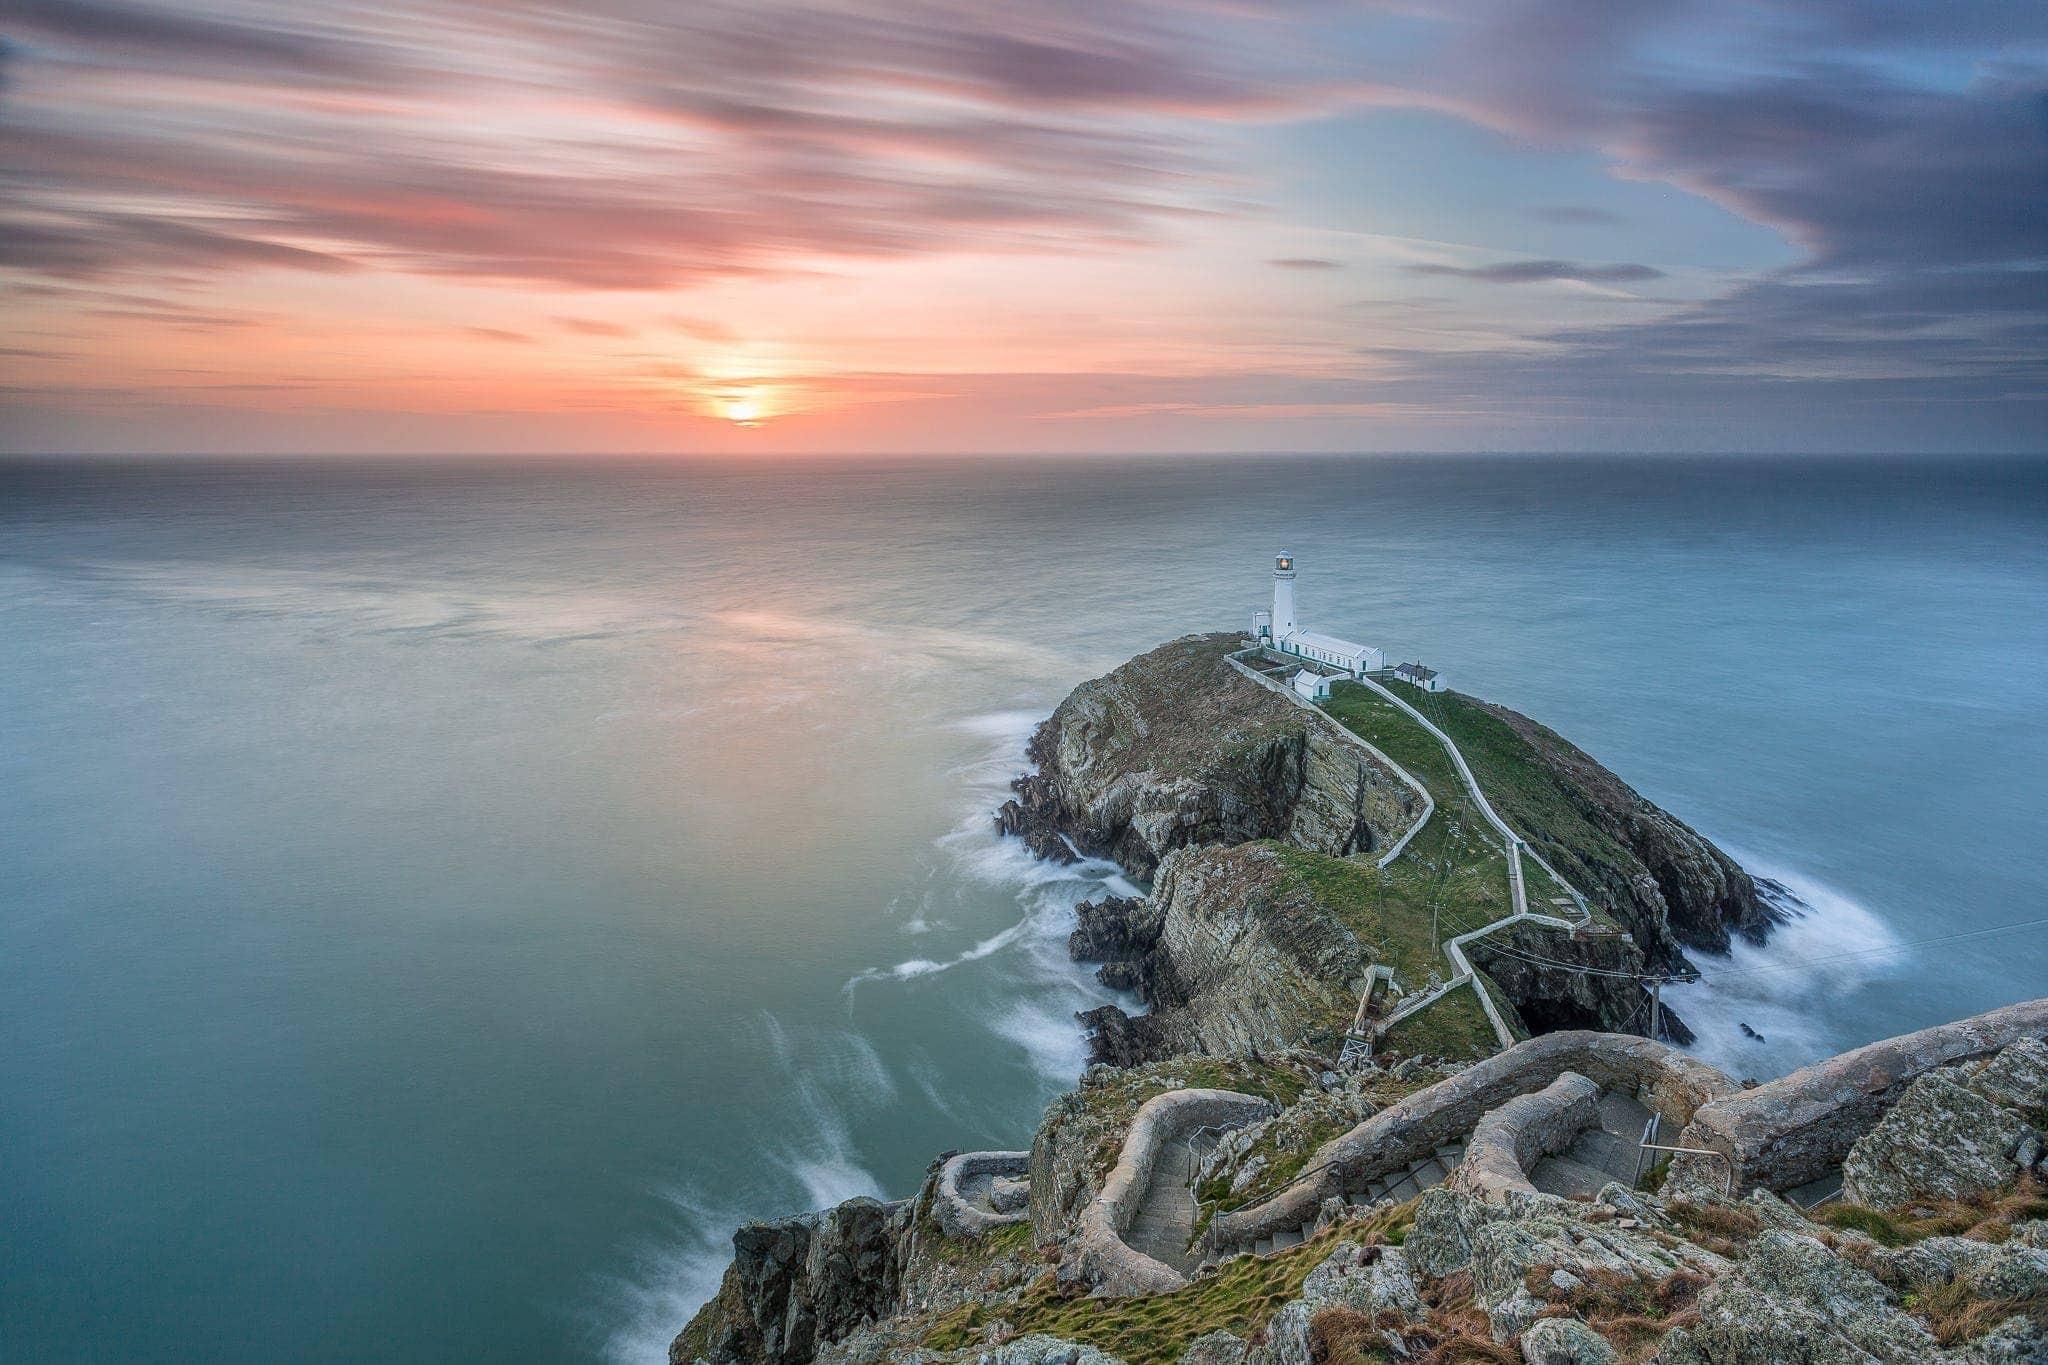 Francesco Gola Seascape Landscape Photography Uk Wales Galles Lighthouse South Stack Long Exposure